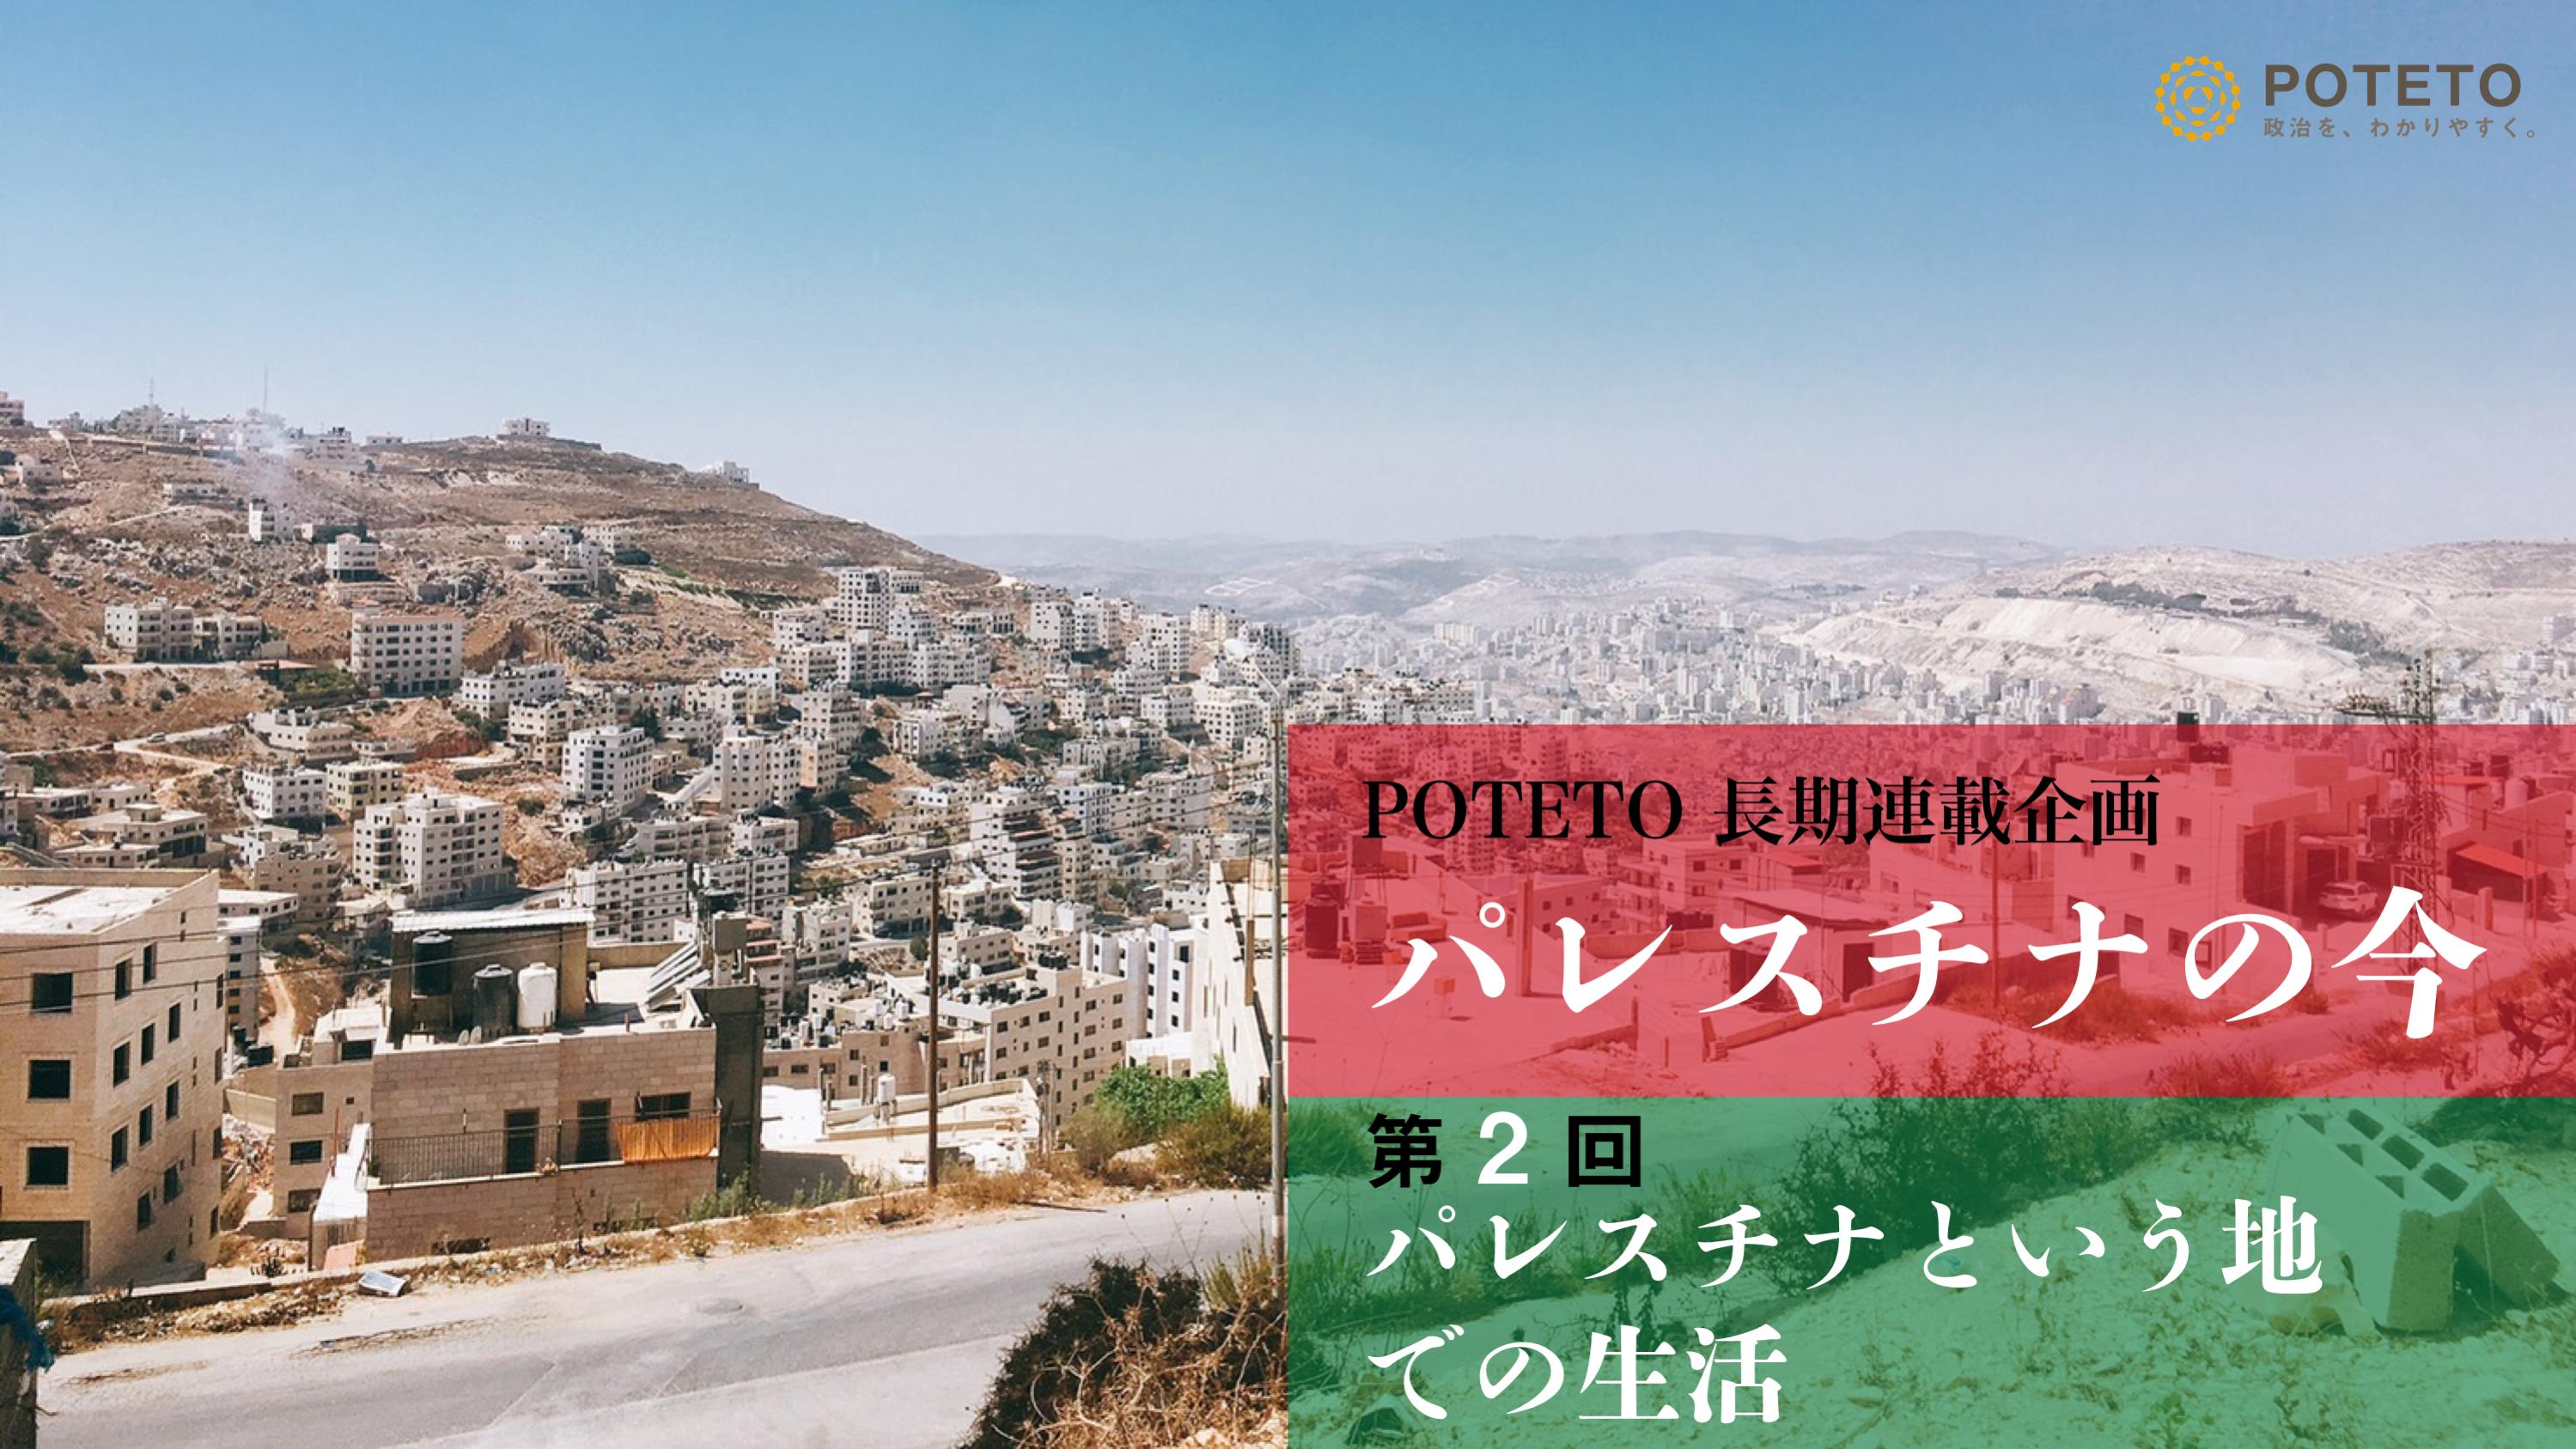 386e2edf89ff56610b781fc4e5a79f88 1 - パレスチナという地での生活<br>【長期連載〜パレスチナの今〜第2回】